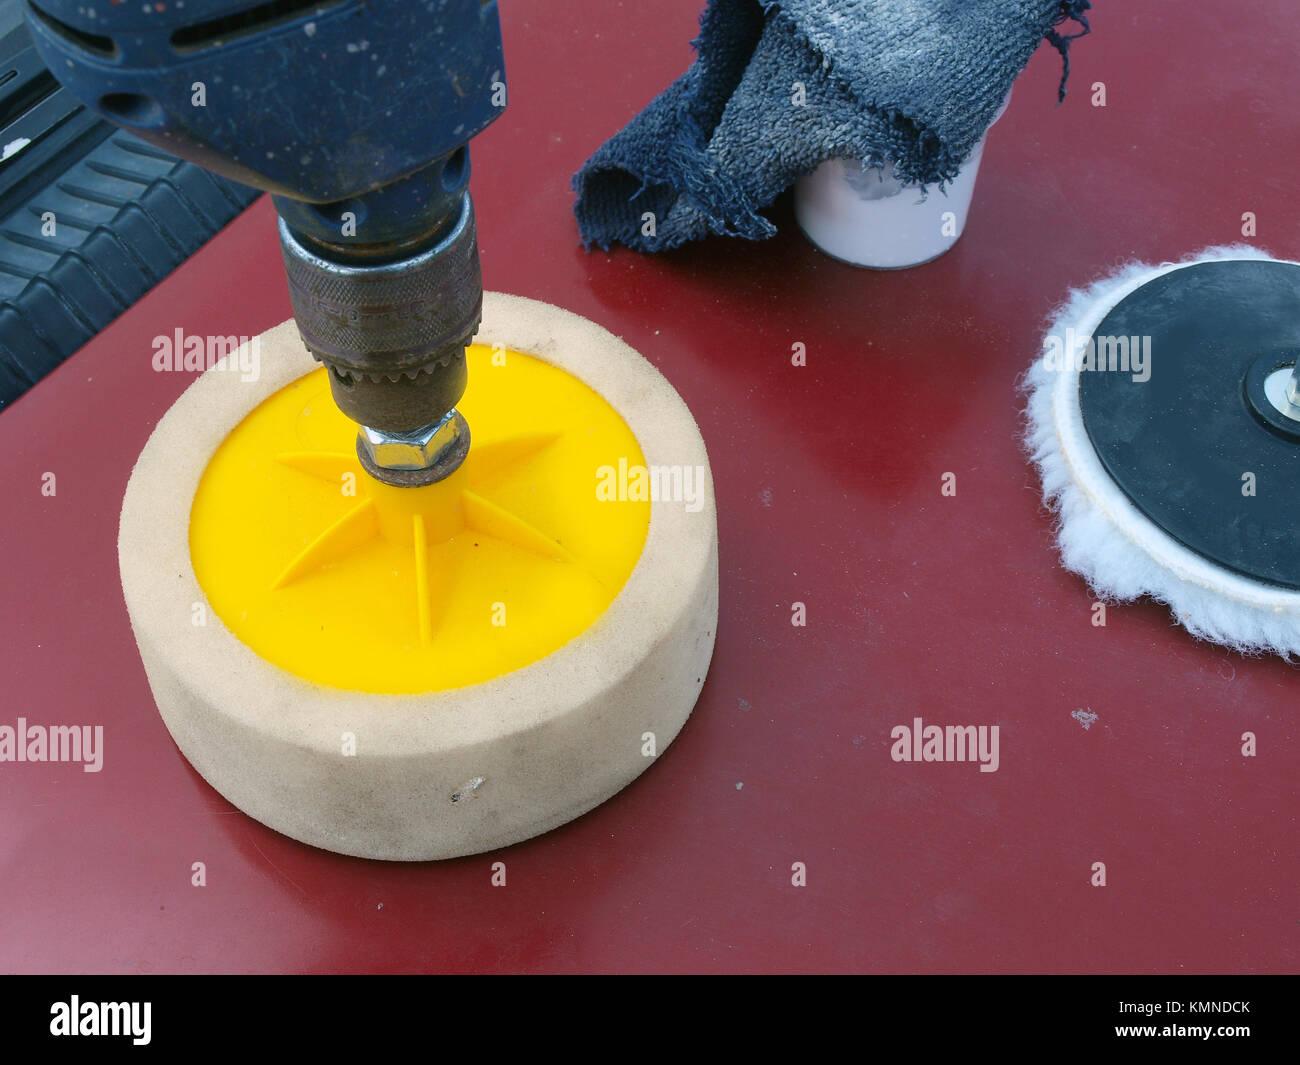 polishing car stockfotos polishing car bilder alamy. Black Bedroom Furniture Sets. Home Design Ideas